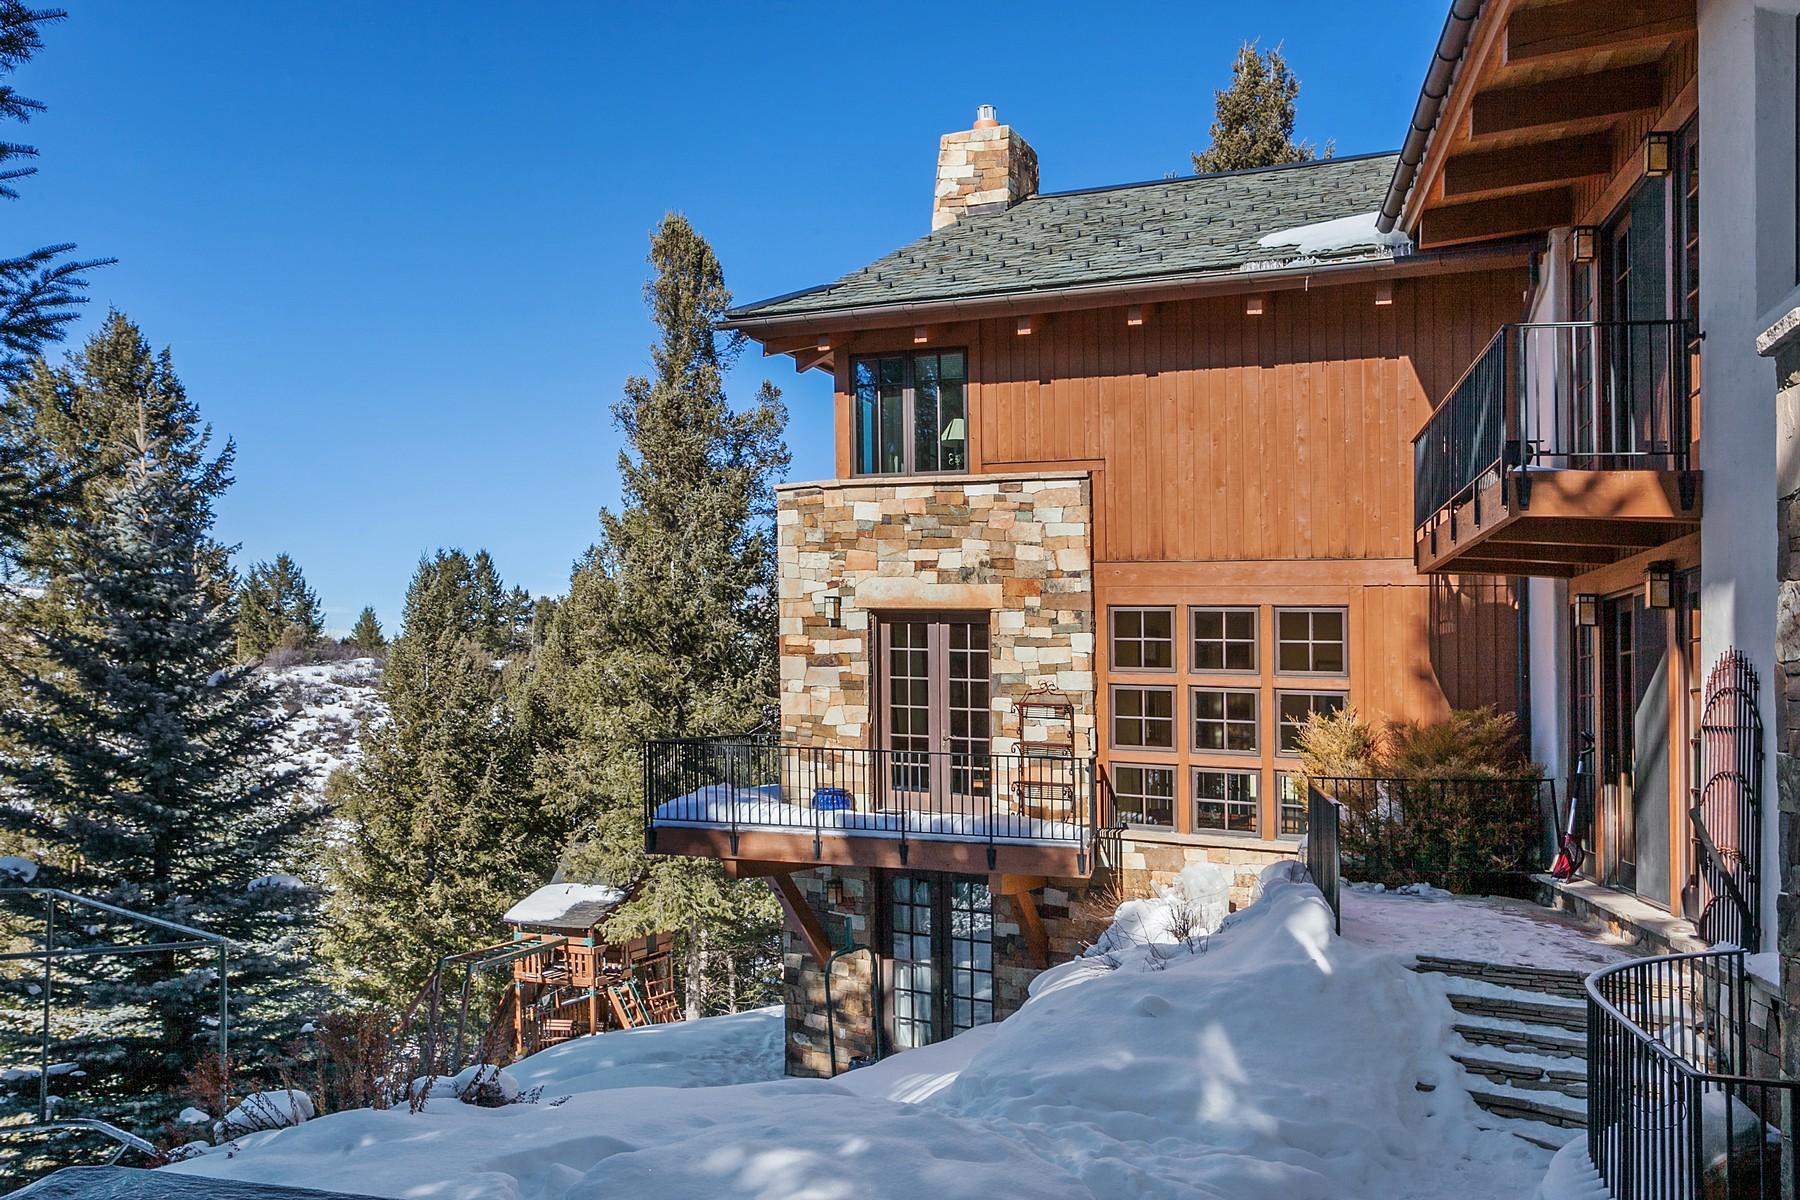 Single Family Home for Sale at 382 El Mirador Cordillera, Edwards, Colorado, 81632 United States